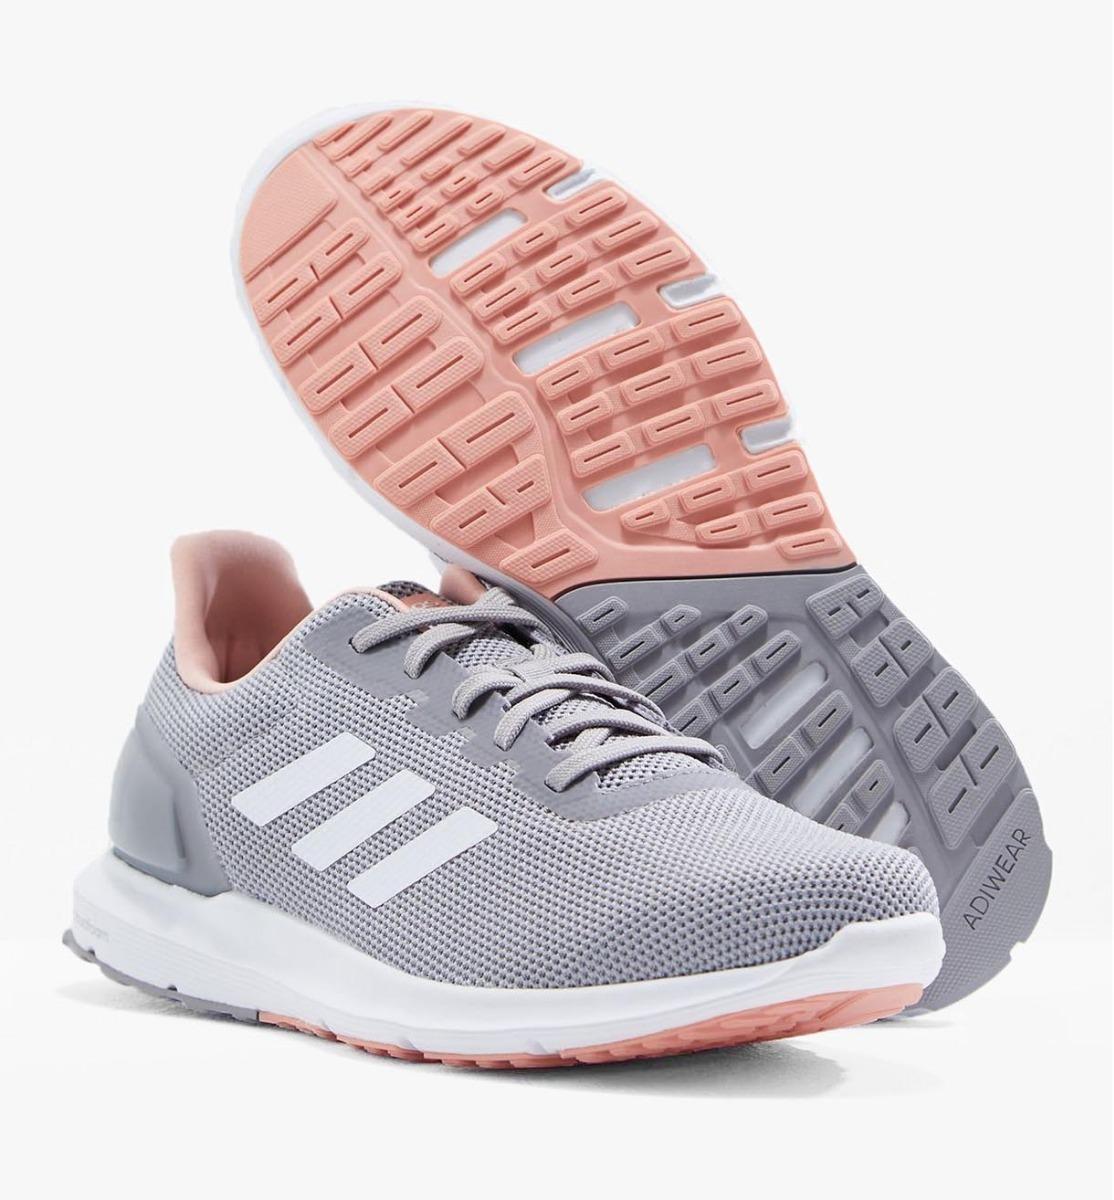 dc0f23f68 tênis adidas cosmic 2 feminino cinza/branco original. Carregando zoom... tênis  adidas feminino. Carregando zoom.